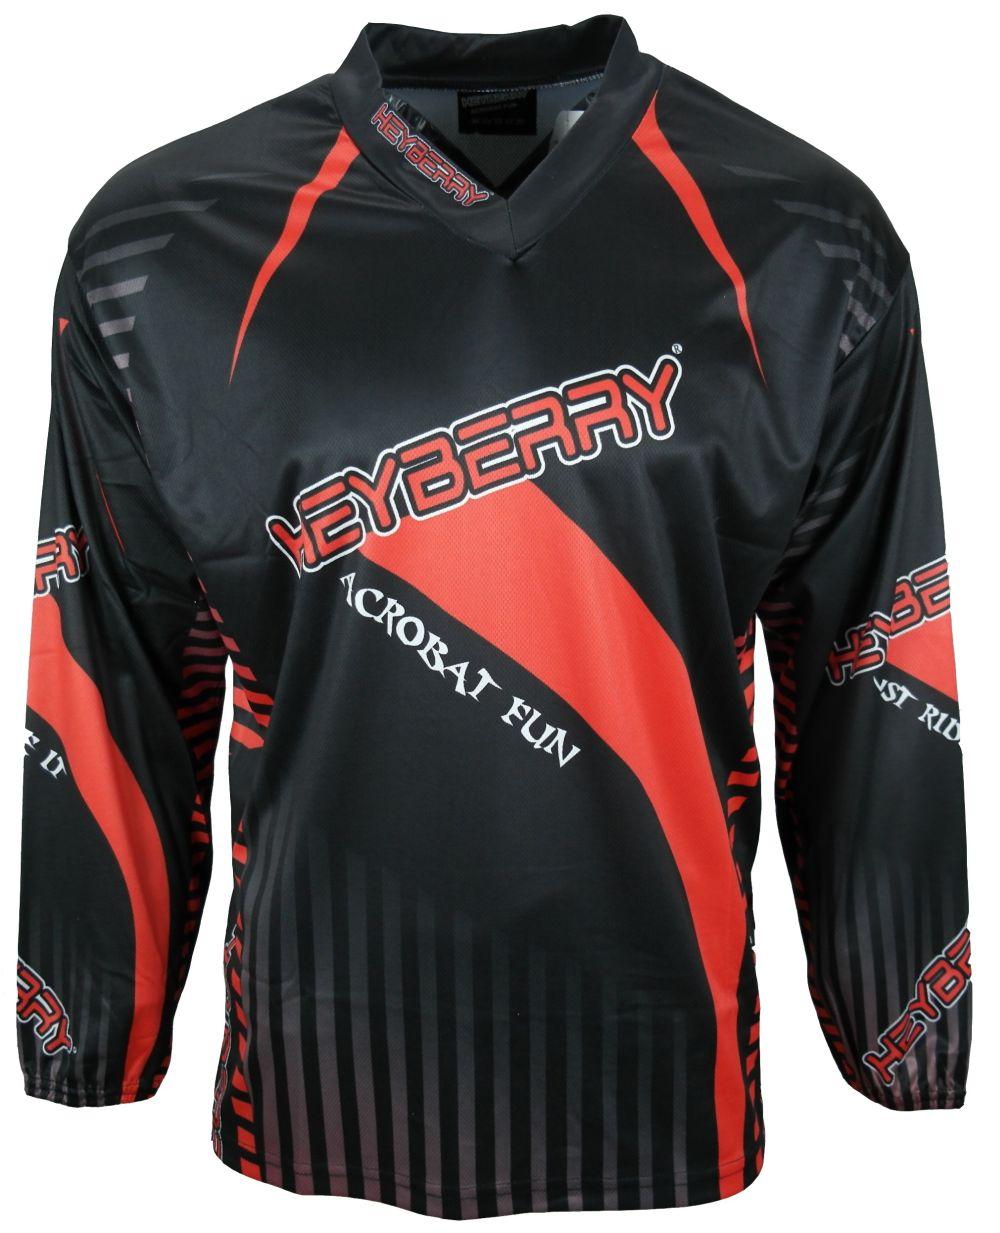 Heyberry Motocross MX Shirt Jersey Trikot schwarz rot Größe M L XL XXL